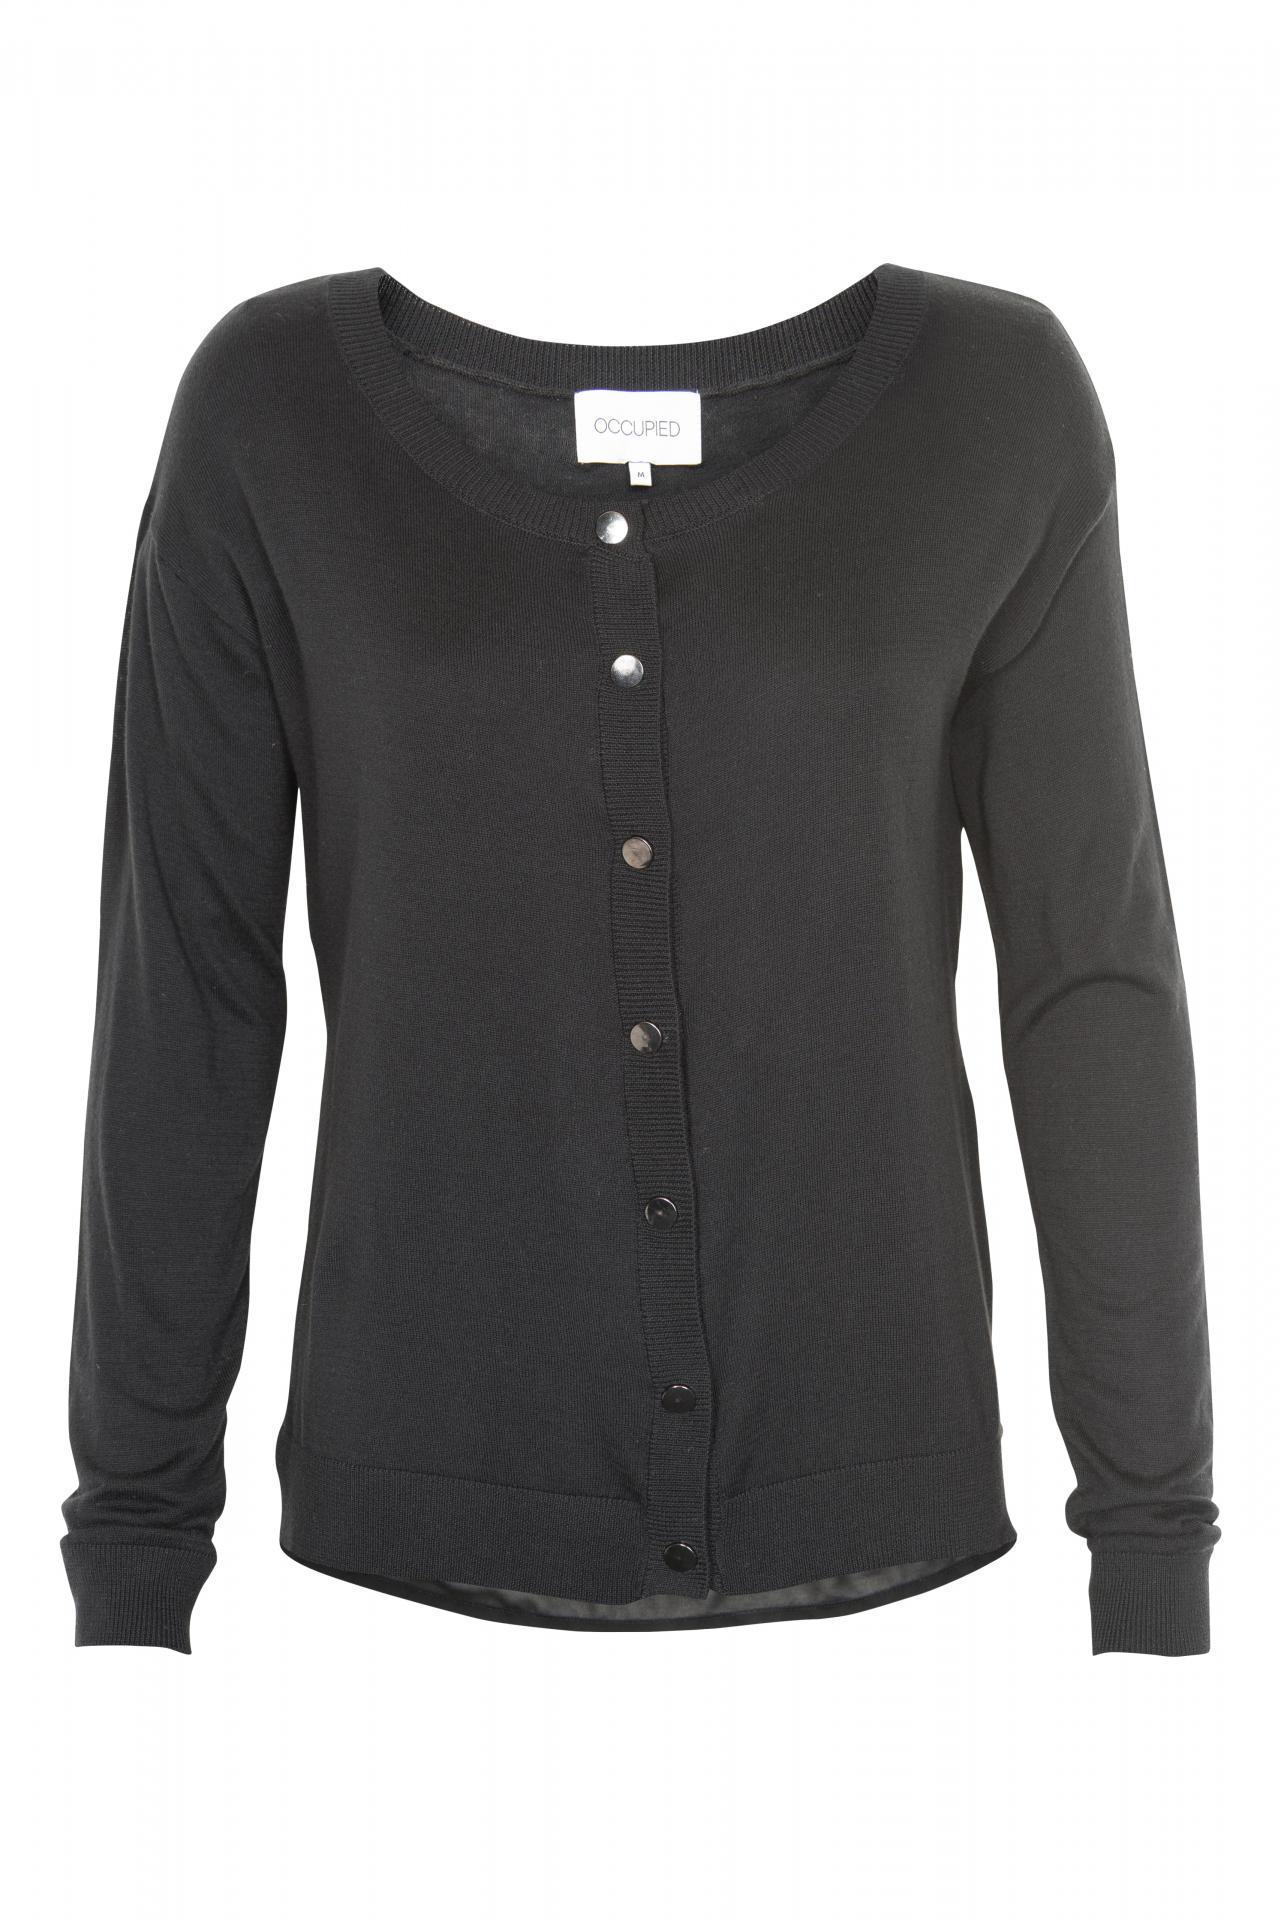 Cardigan Divide Black Velikost S, černá barva, textil